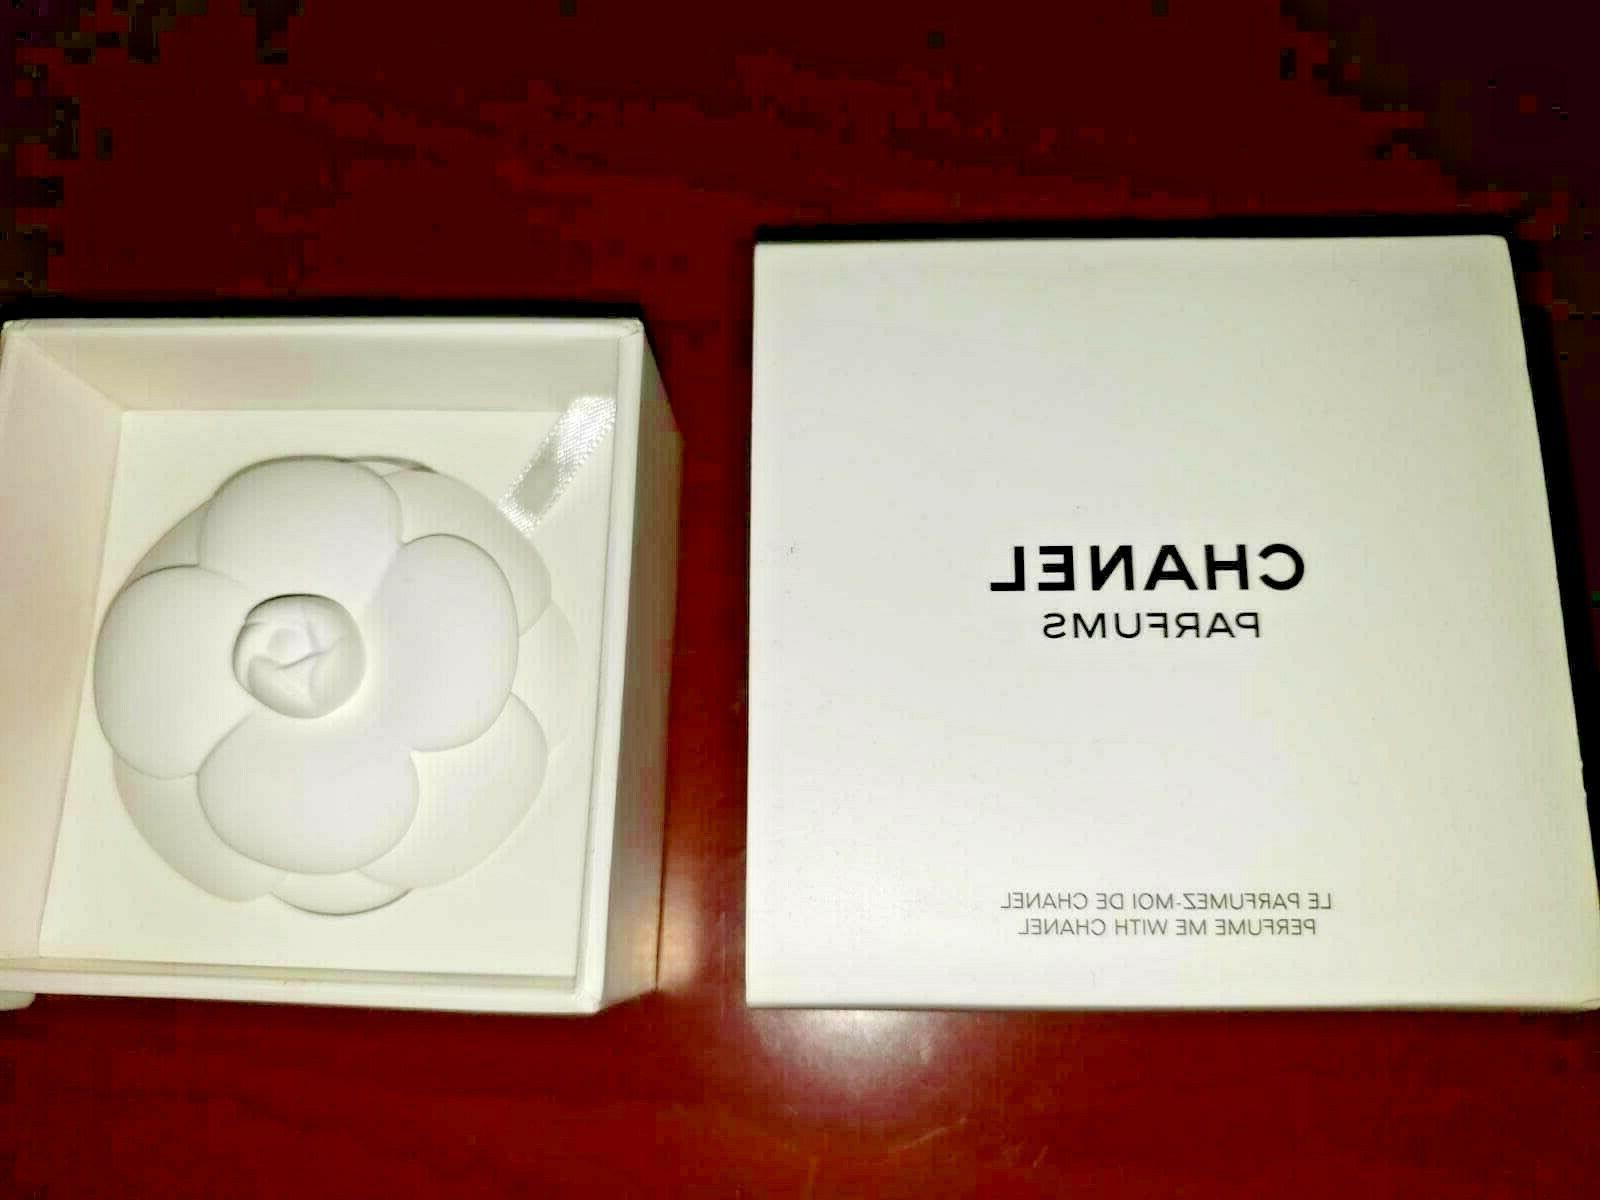 Chanel flower Perfume Diffuser